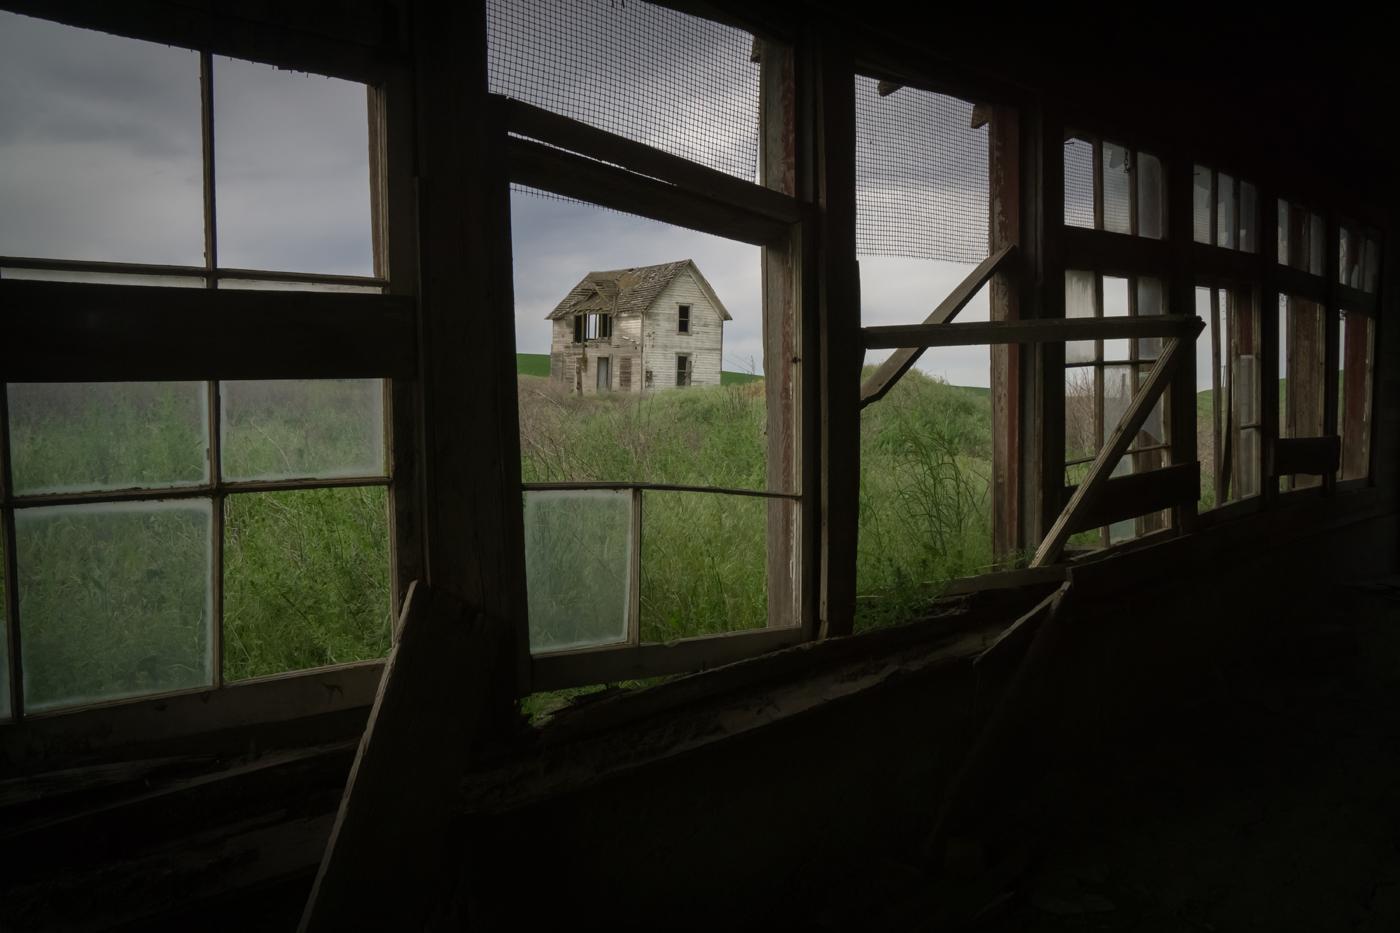 Spiegel_Abandoned Dairy Farm Endicott Washington USA